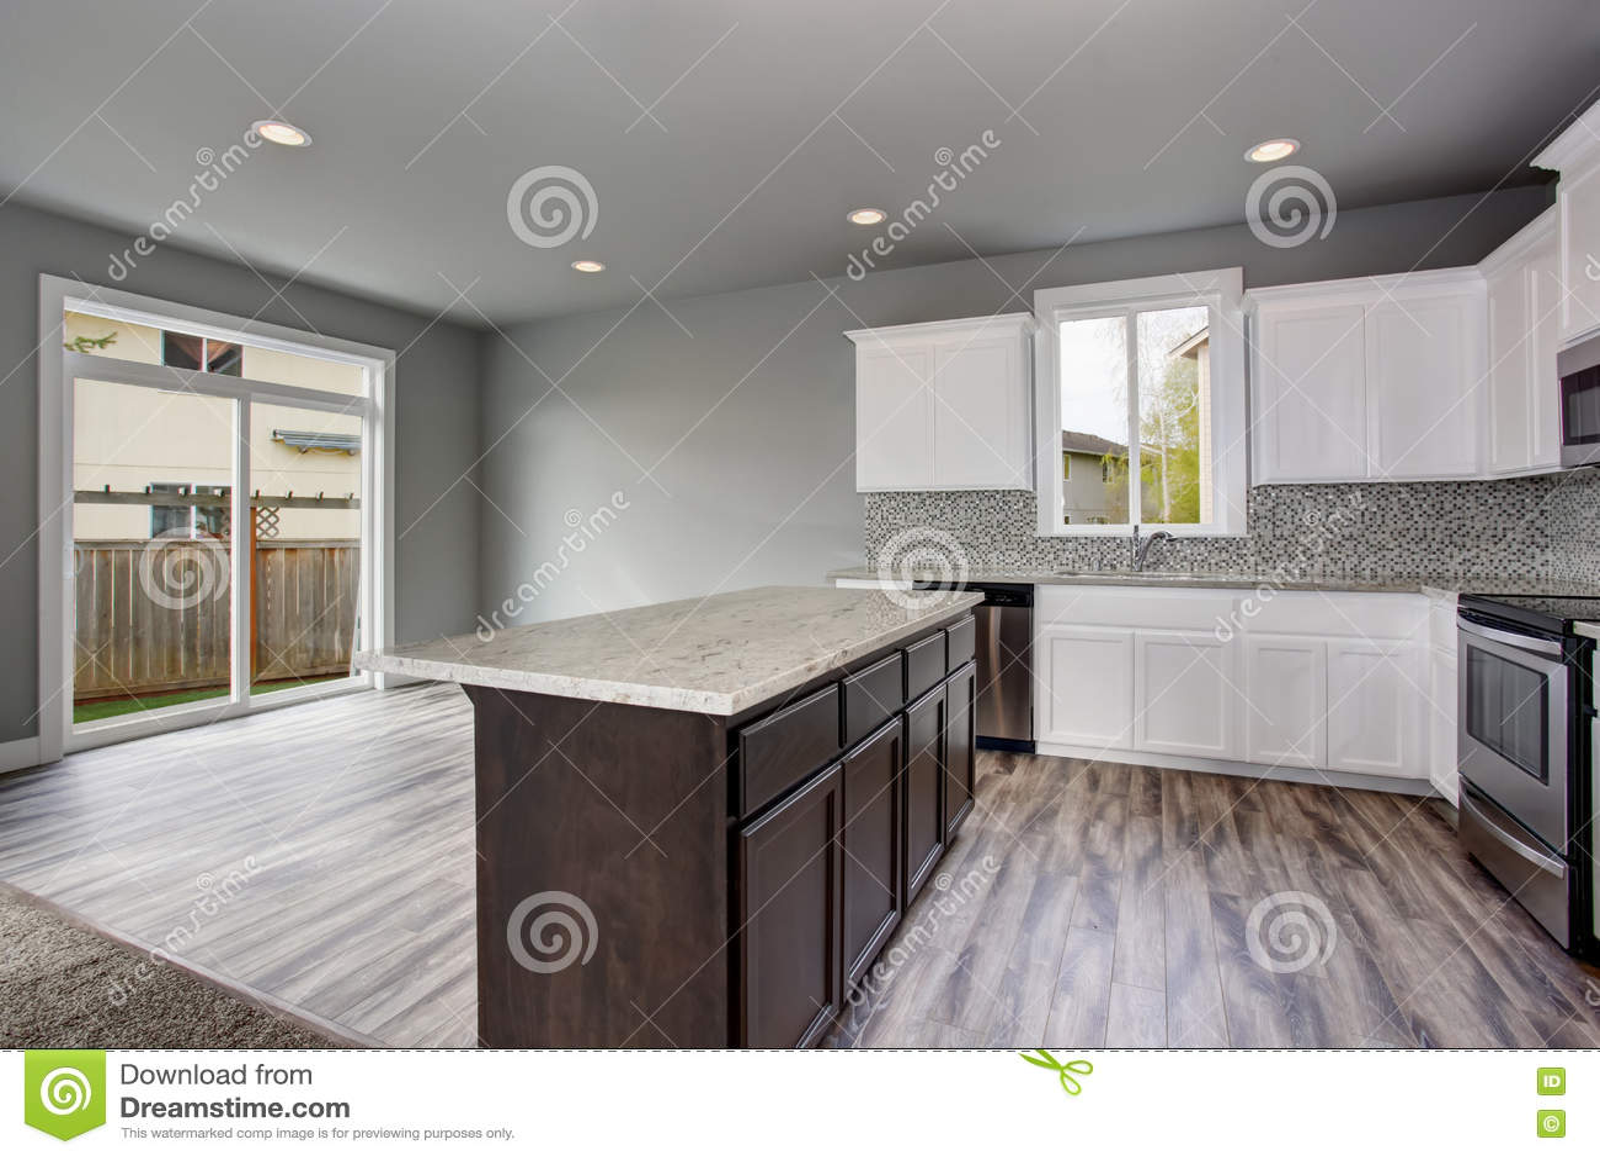 backyard kitchens nautical kitchen hardware 厨房一个空的房子的室内部忽略后院的玻璃门库存照片 图片包括有现代 厨房一个空的房子的室内部忽略后院的玻璃门